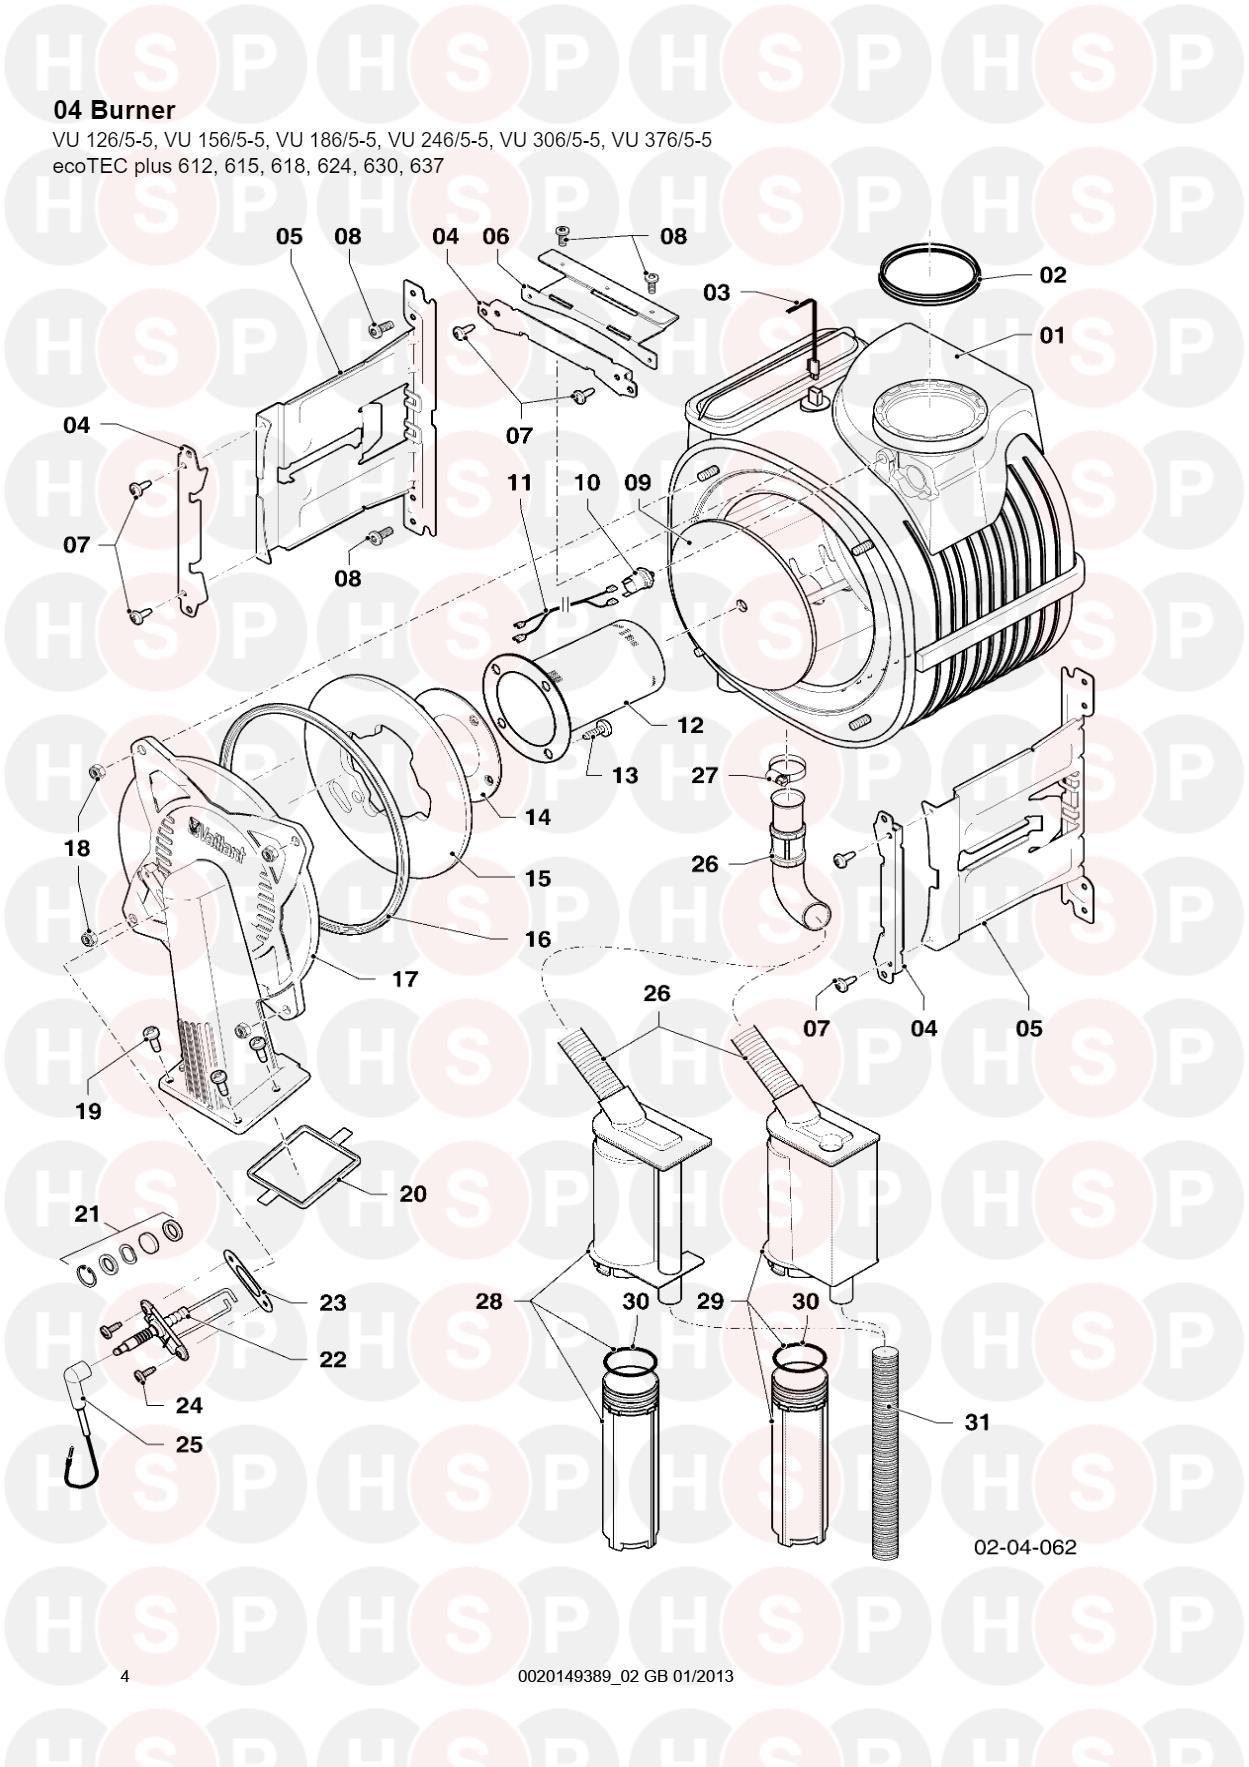 vaillant ecotec plus 430 wiring diagram best wiring